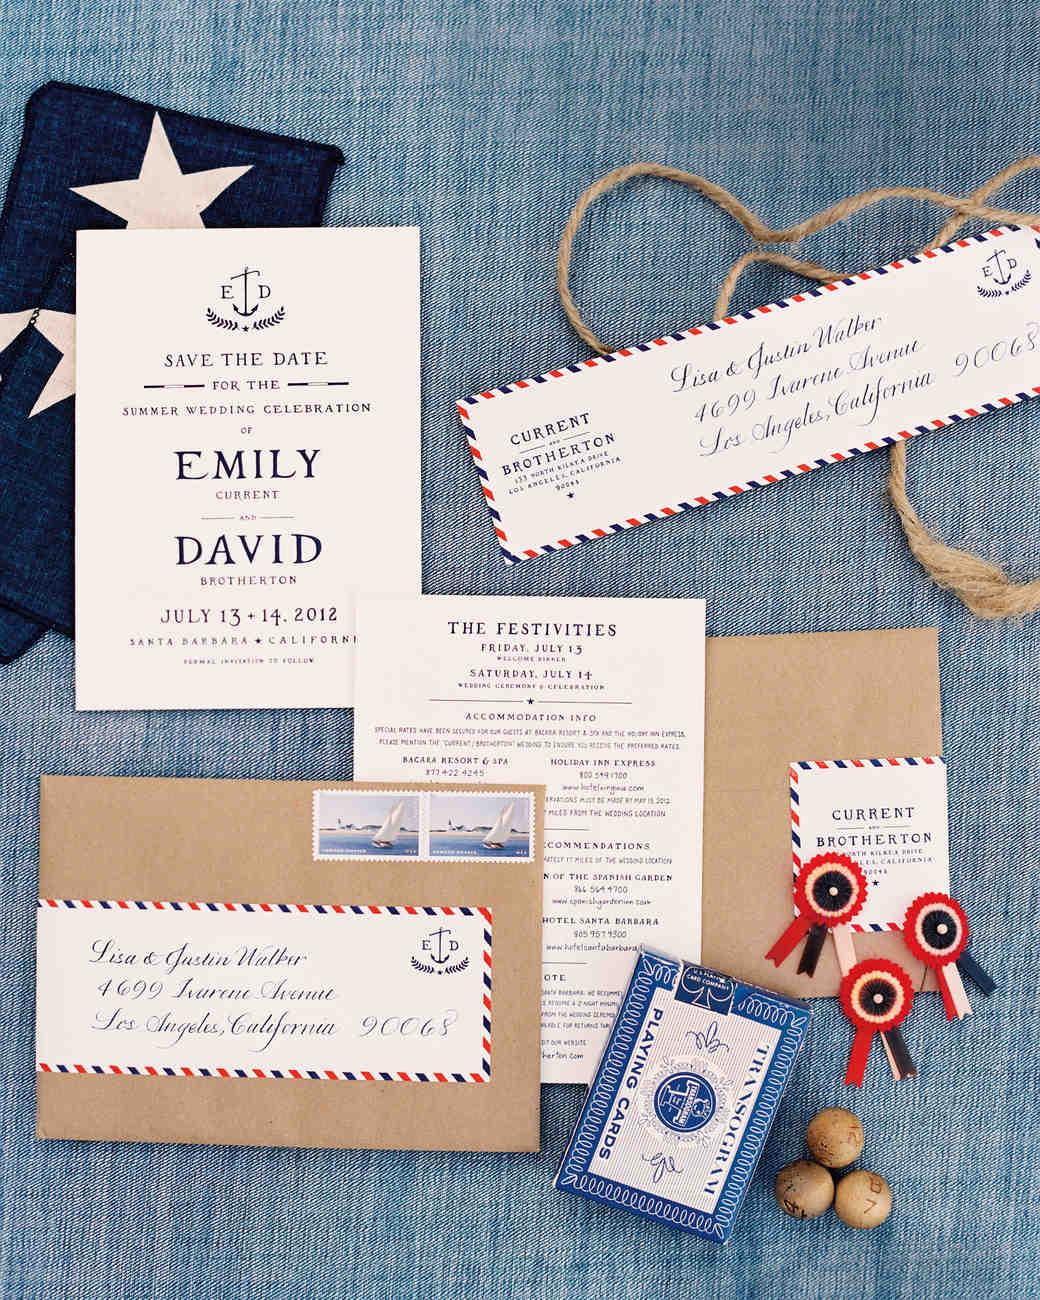 emily-david-invitations-002708-r1-015-mwds110206.jpg